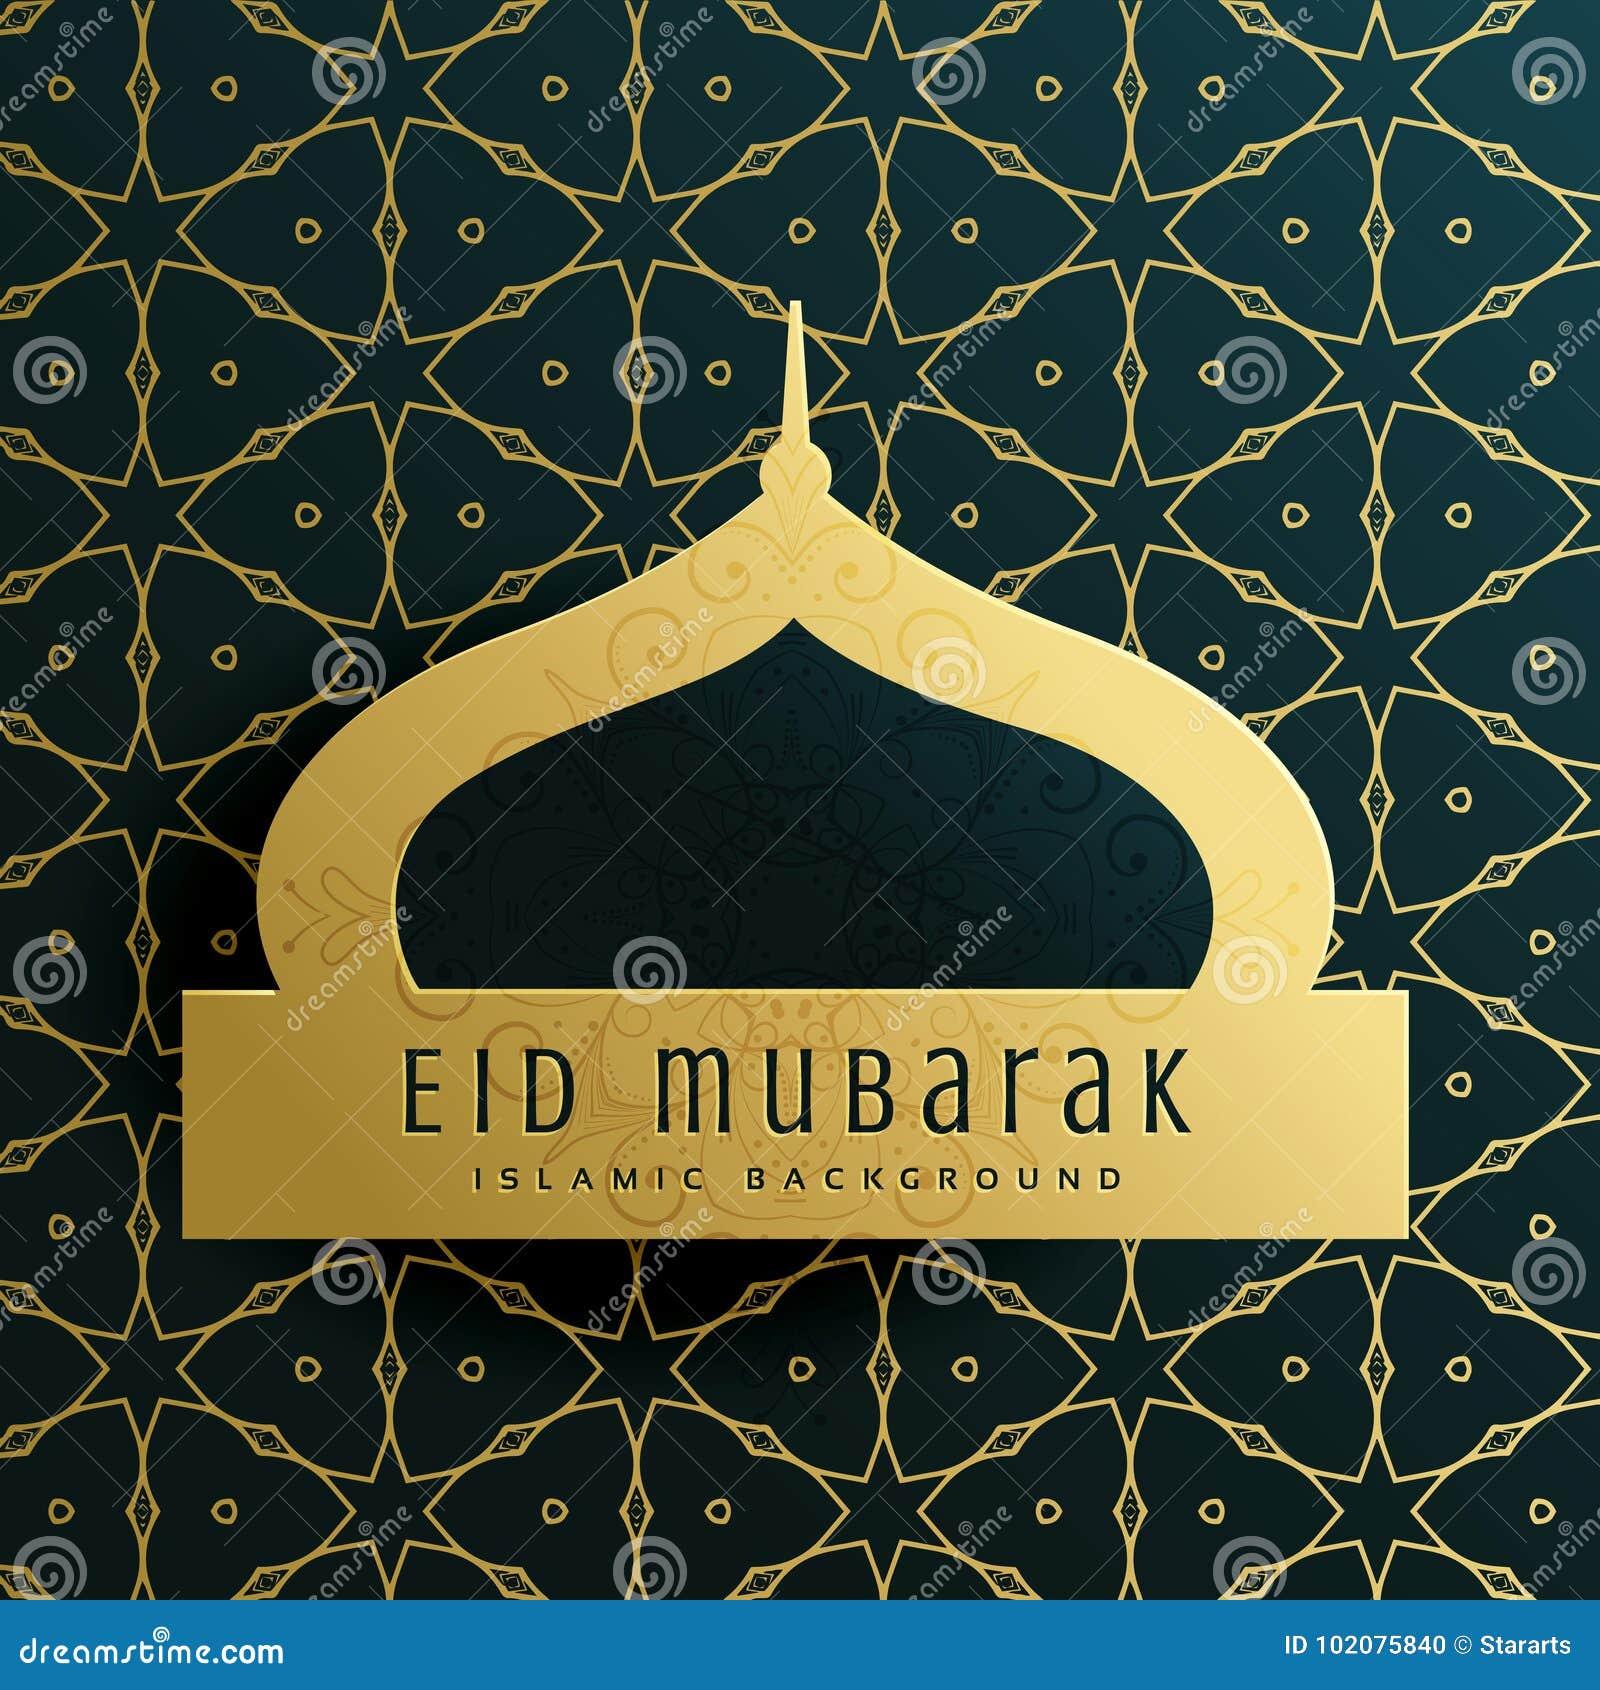 Elegant Eid Mubarak Greeting Card Design With Islamic Pattern Stock Vector Illustration Of Holiday Pattern 102075840